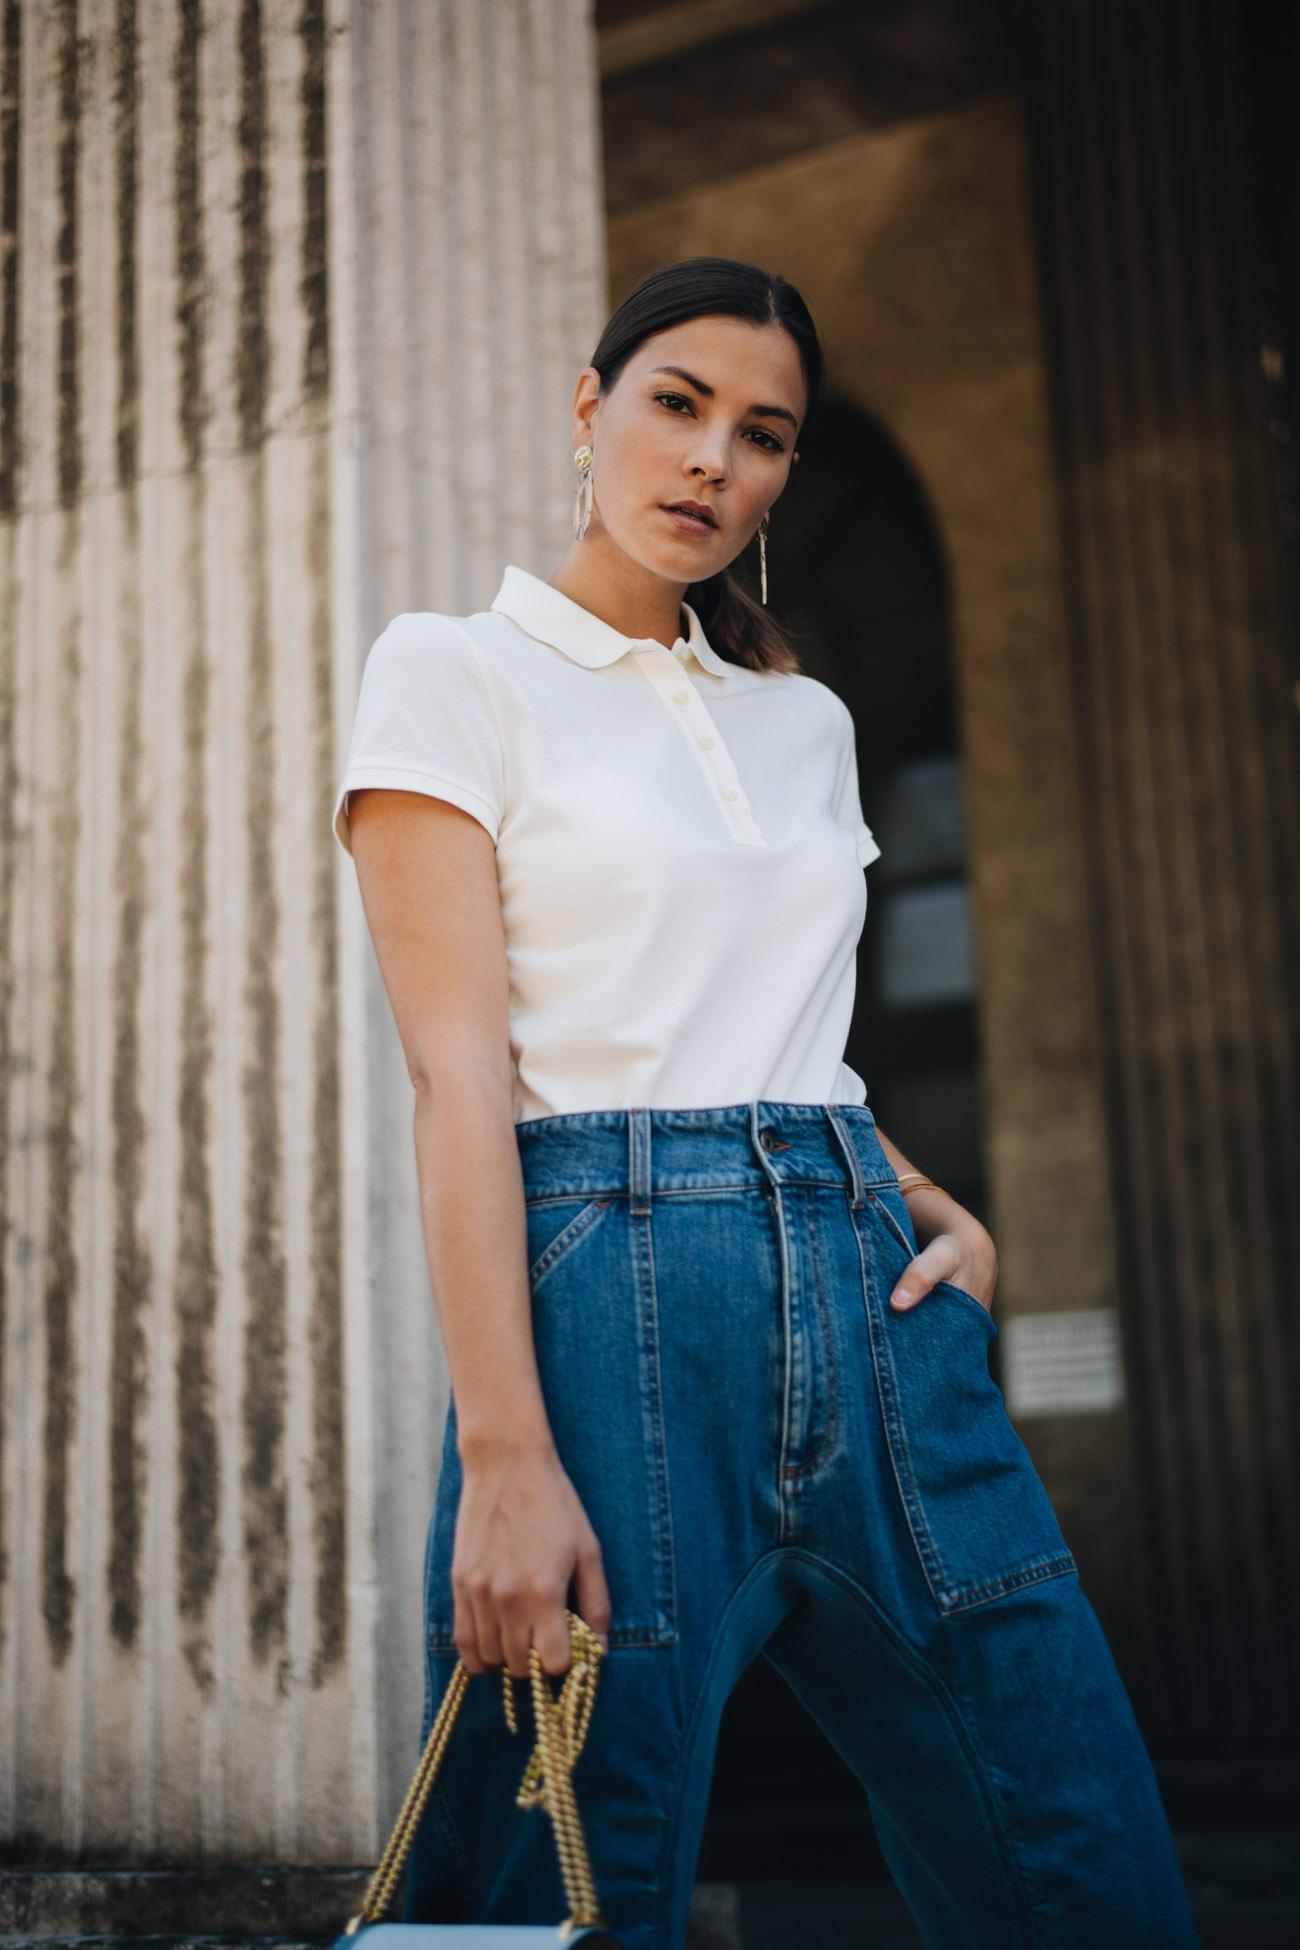 Poloshirt mit Jeanshose kombinieren